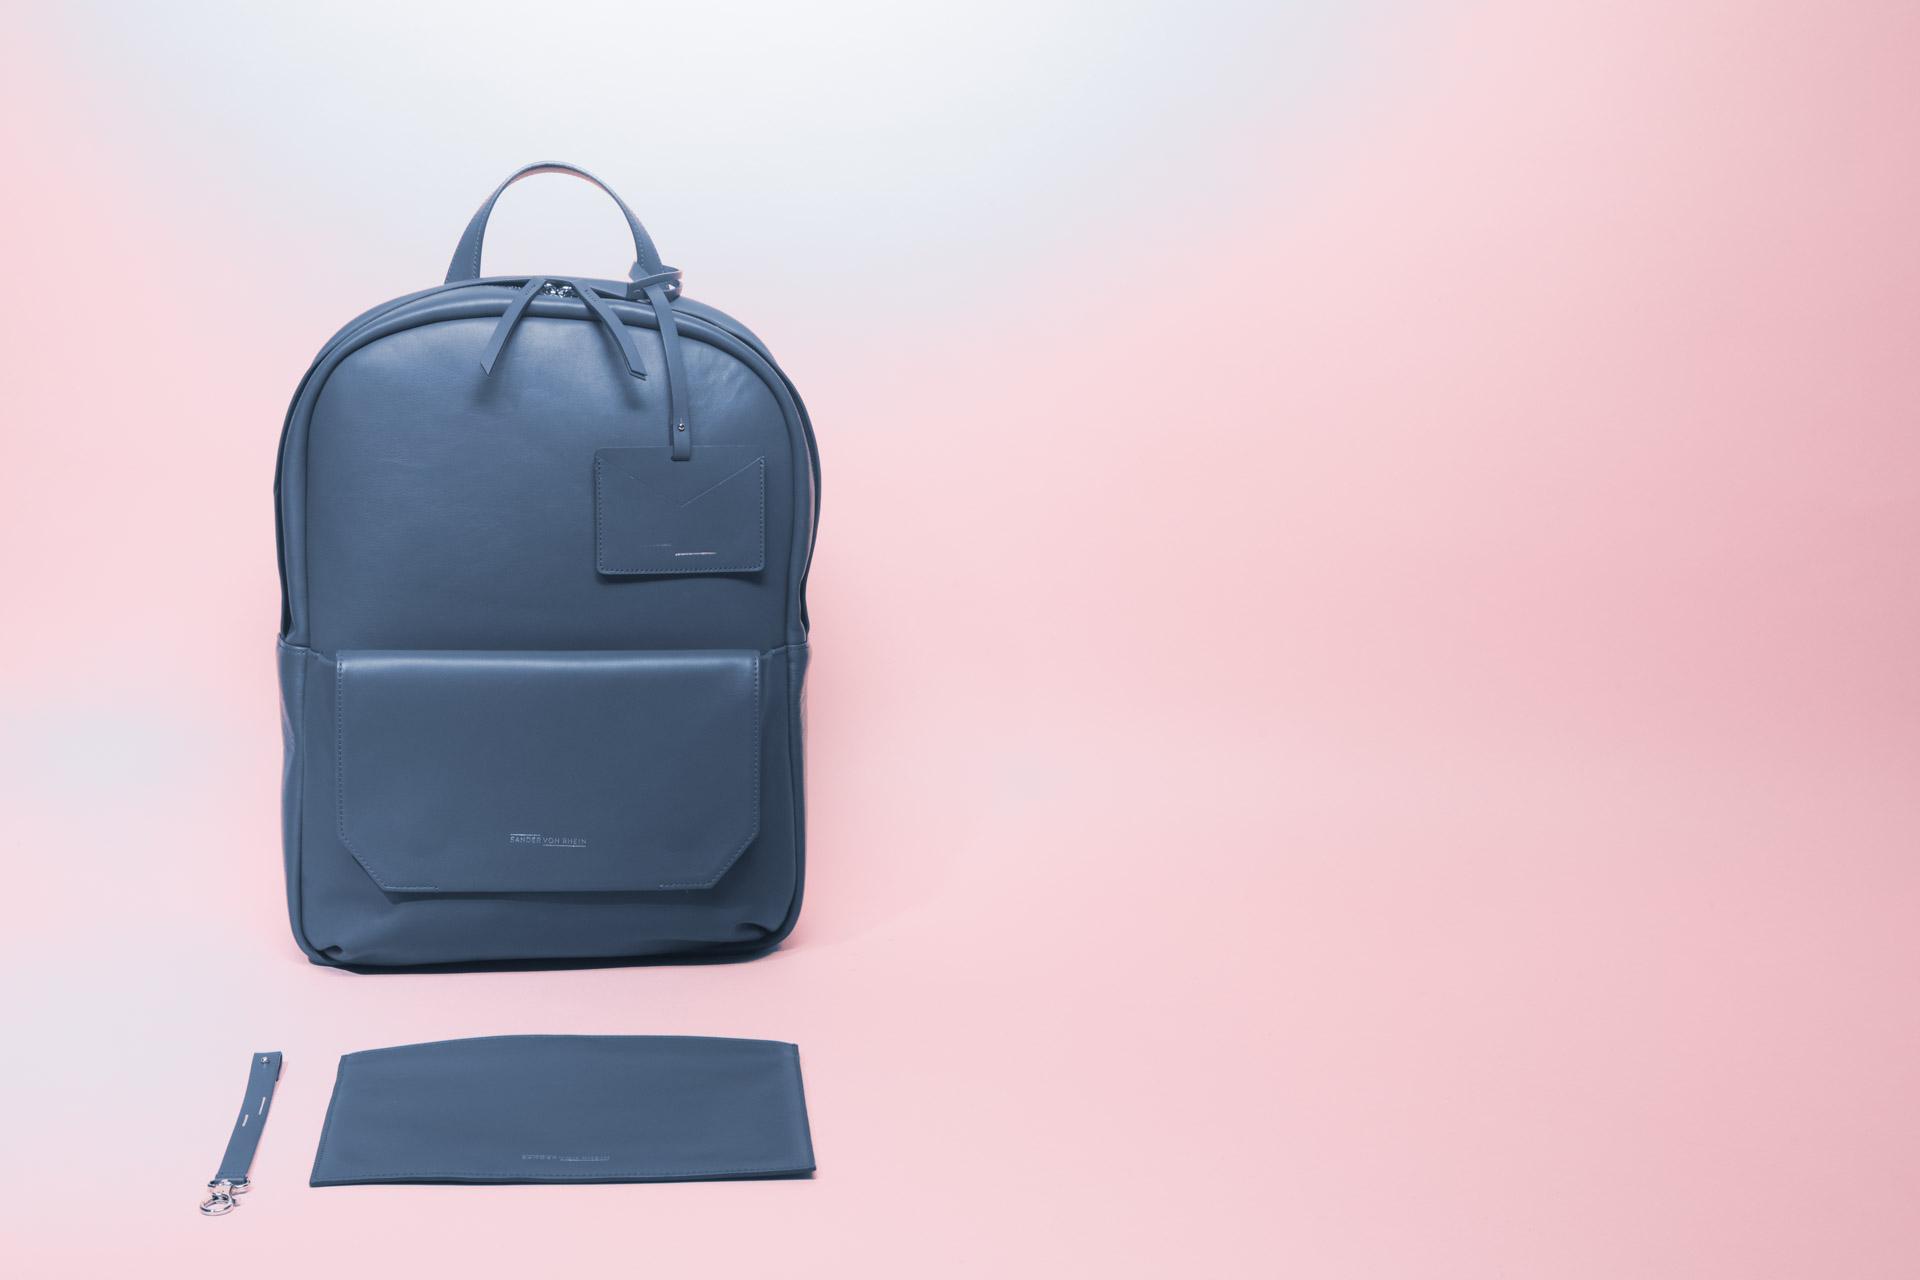 WEB Backup bags shop presentation-90.jpg